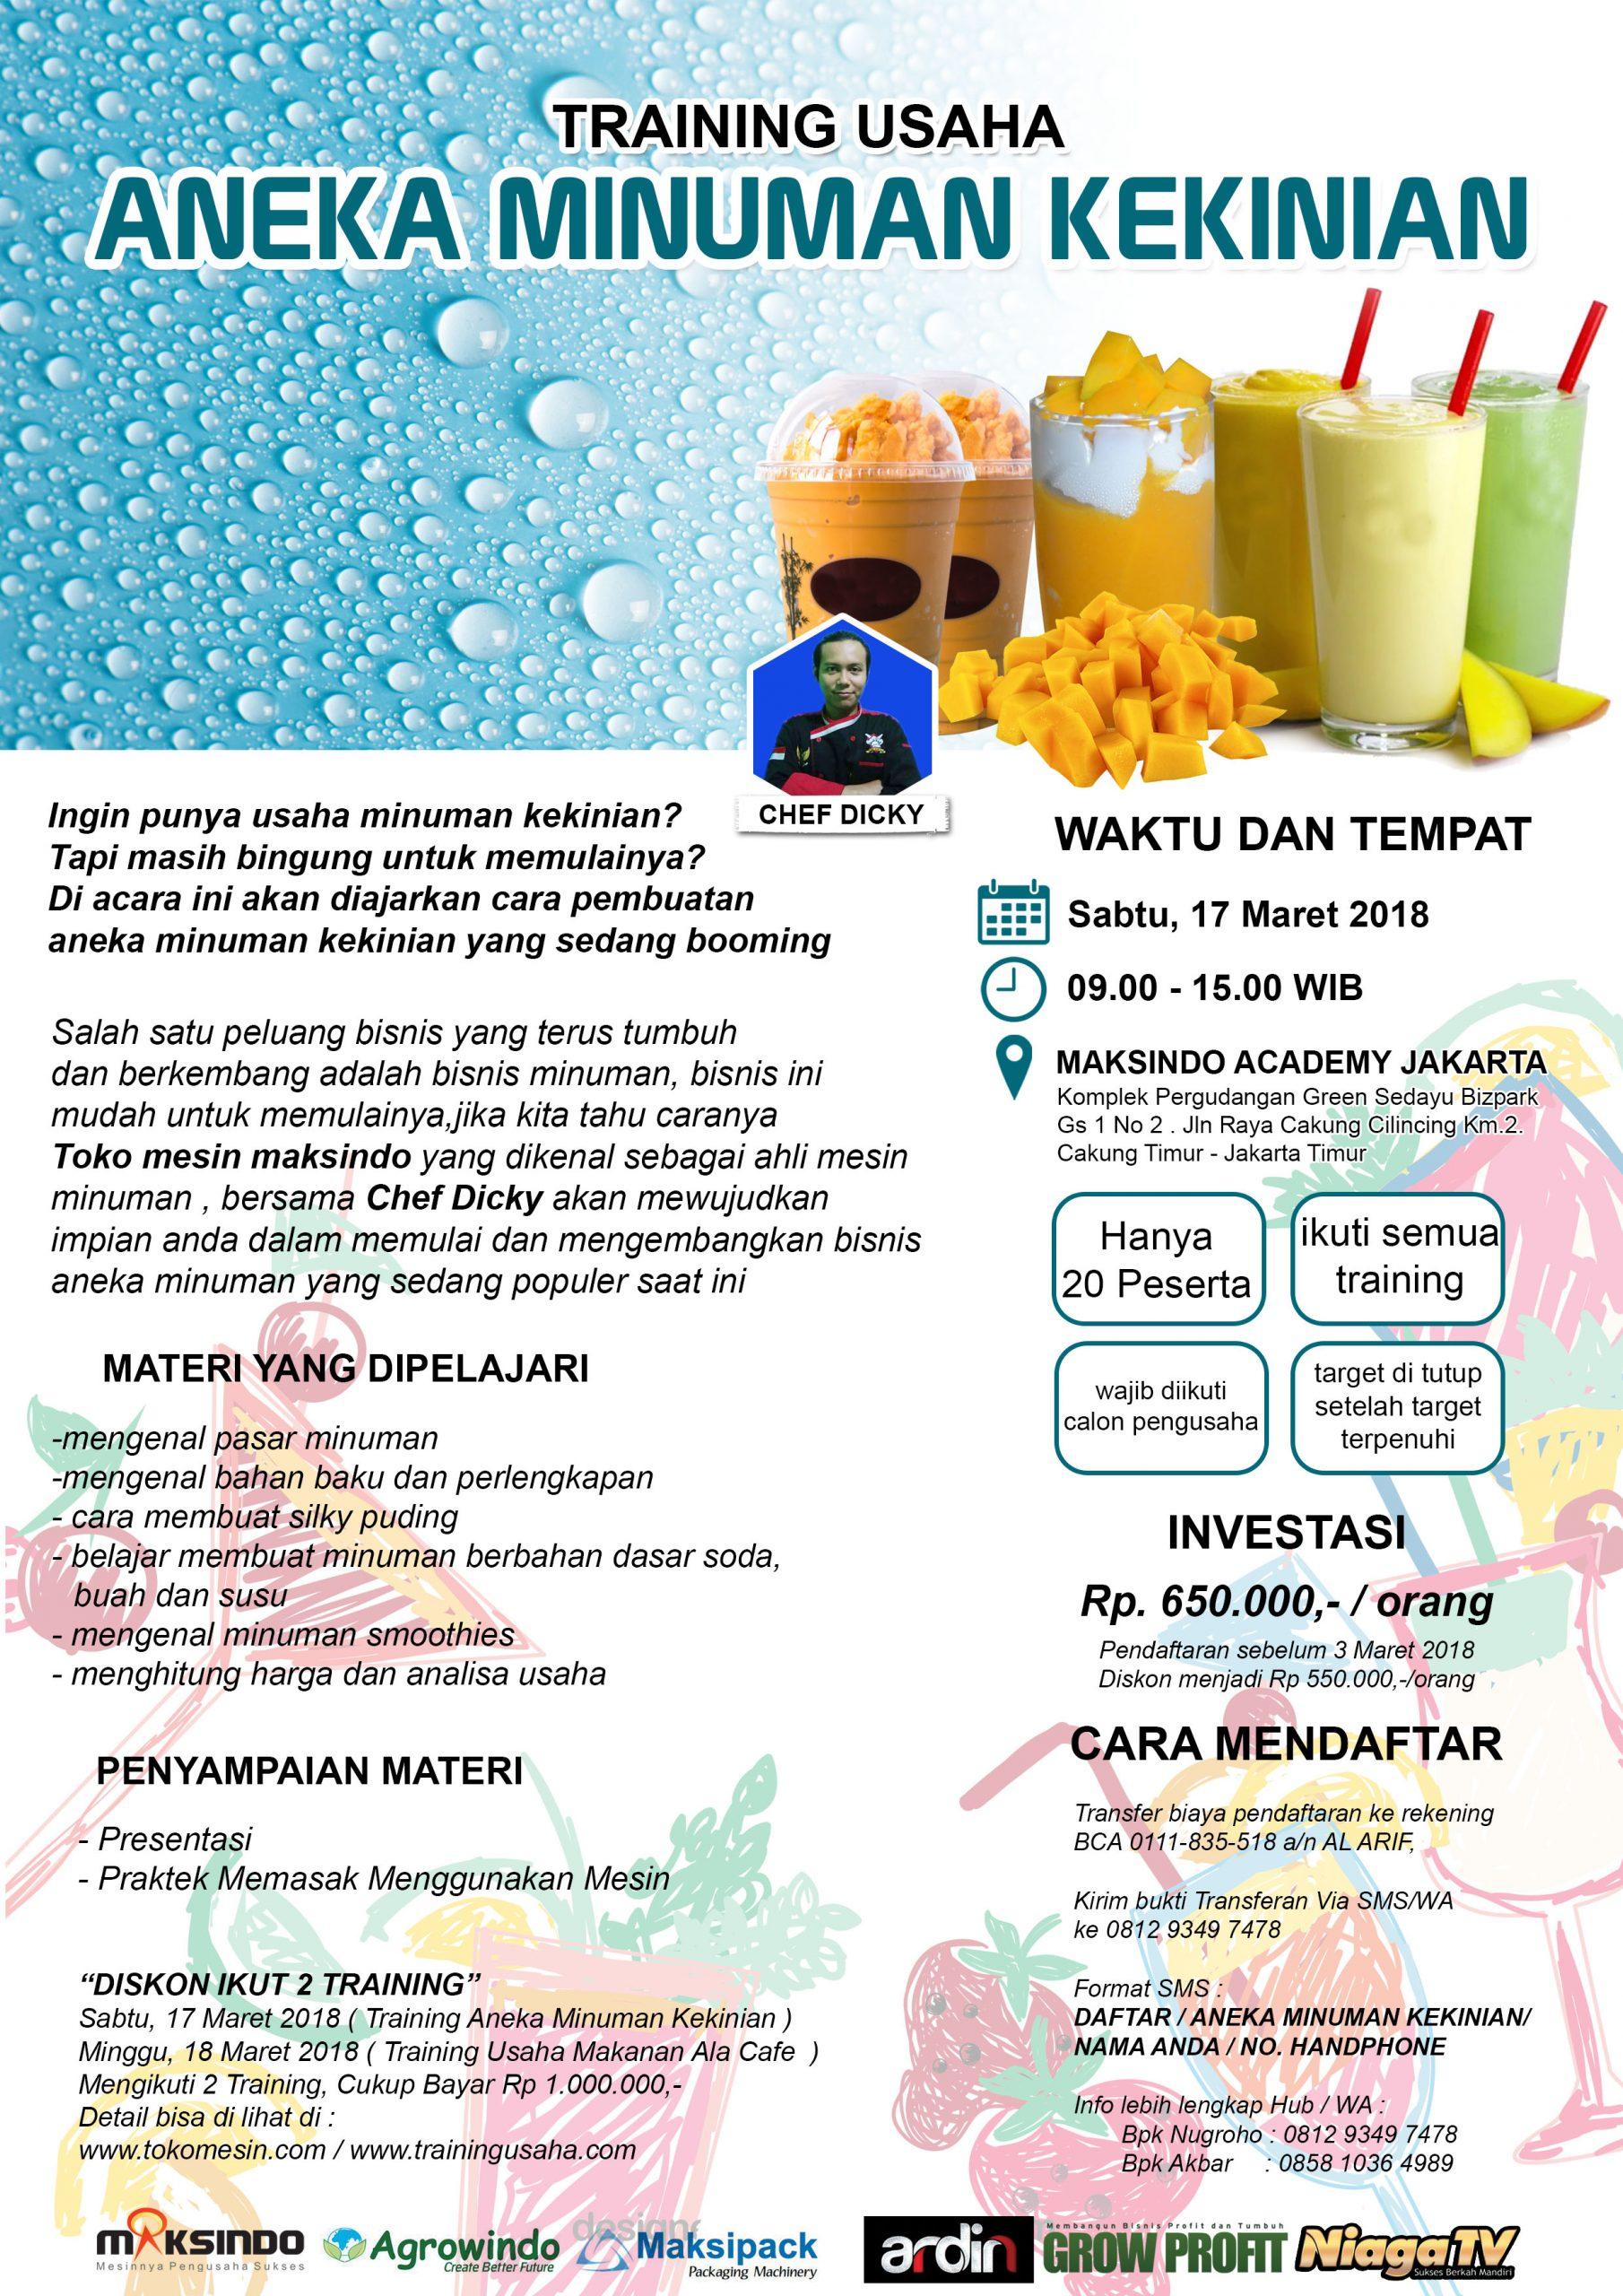 Training Usaha Aneka Minuman Kekinian, 17 Maret 2018